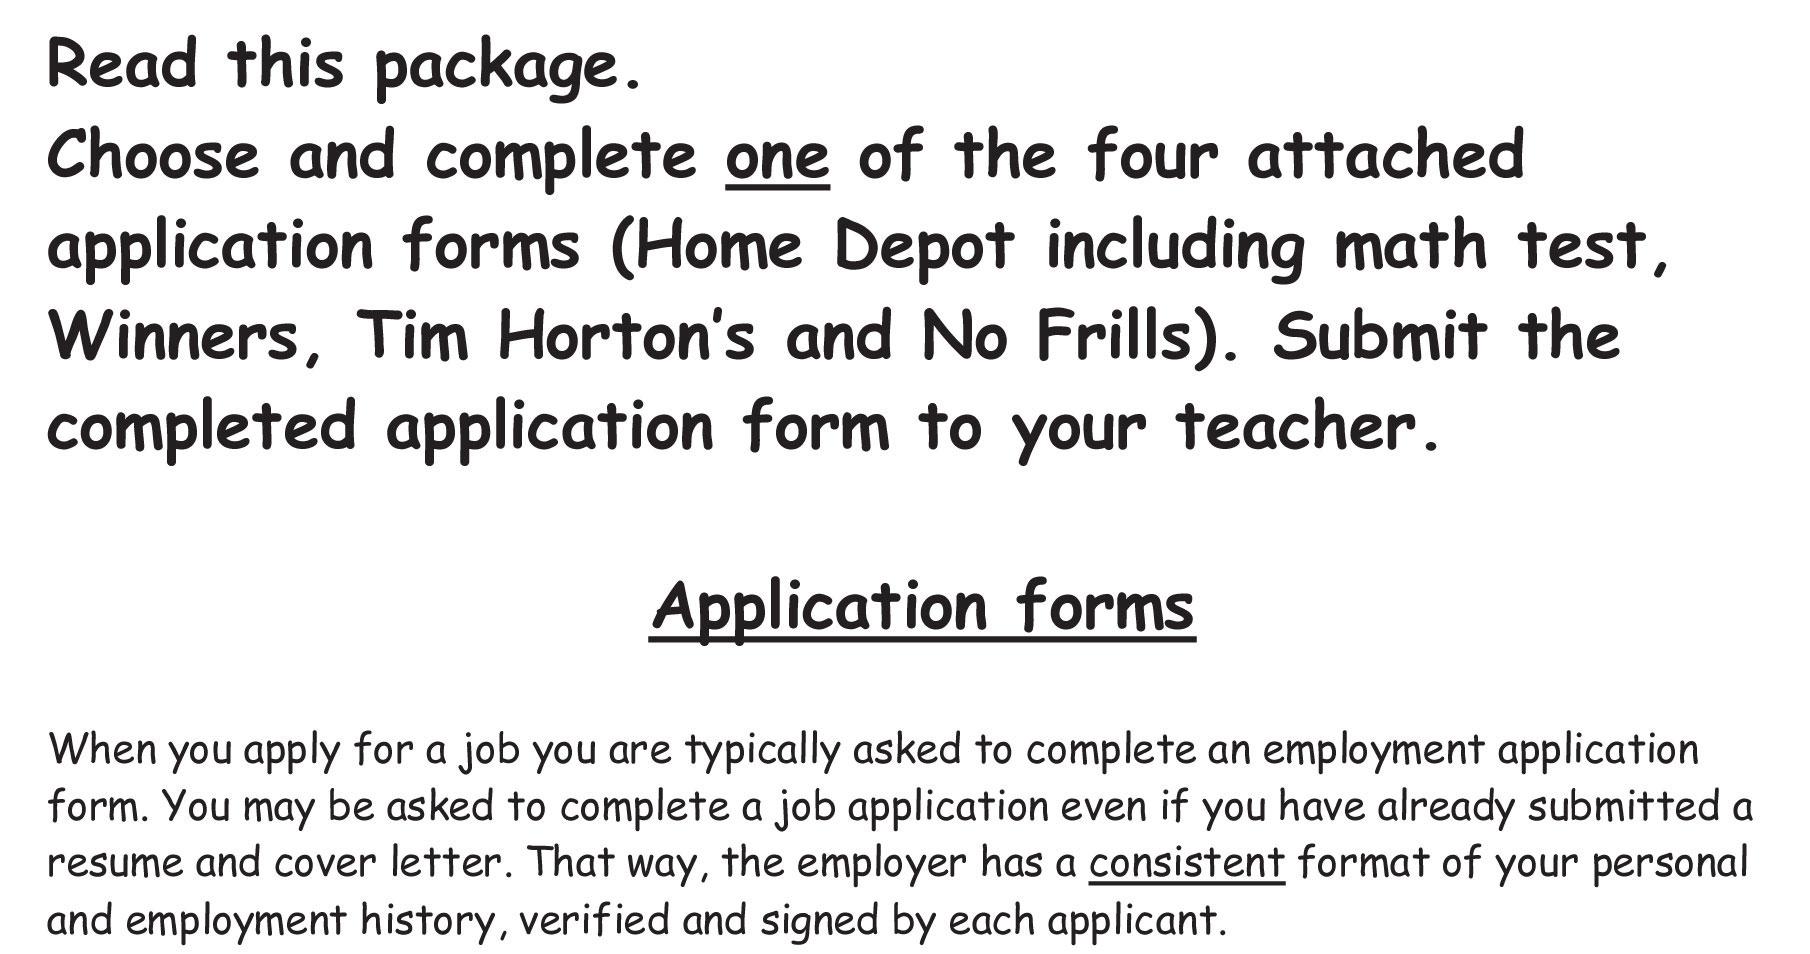 home job application job employment forms